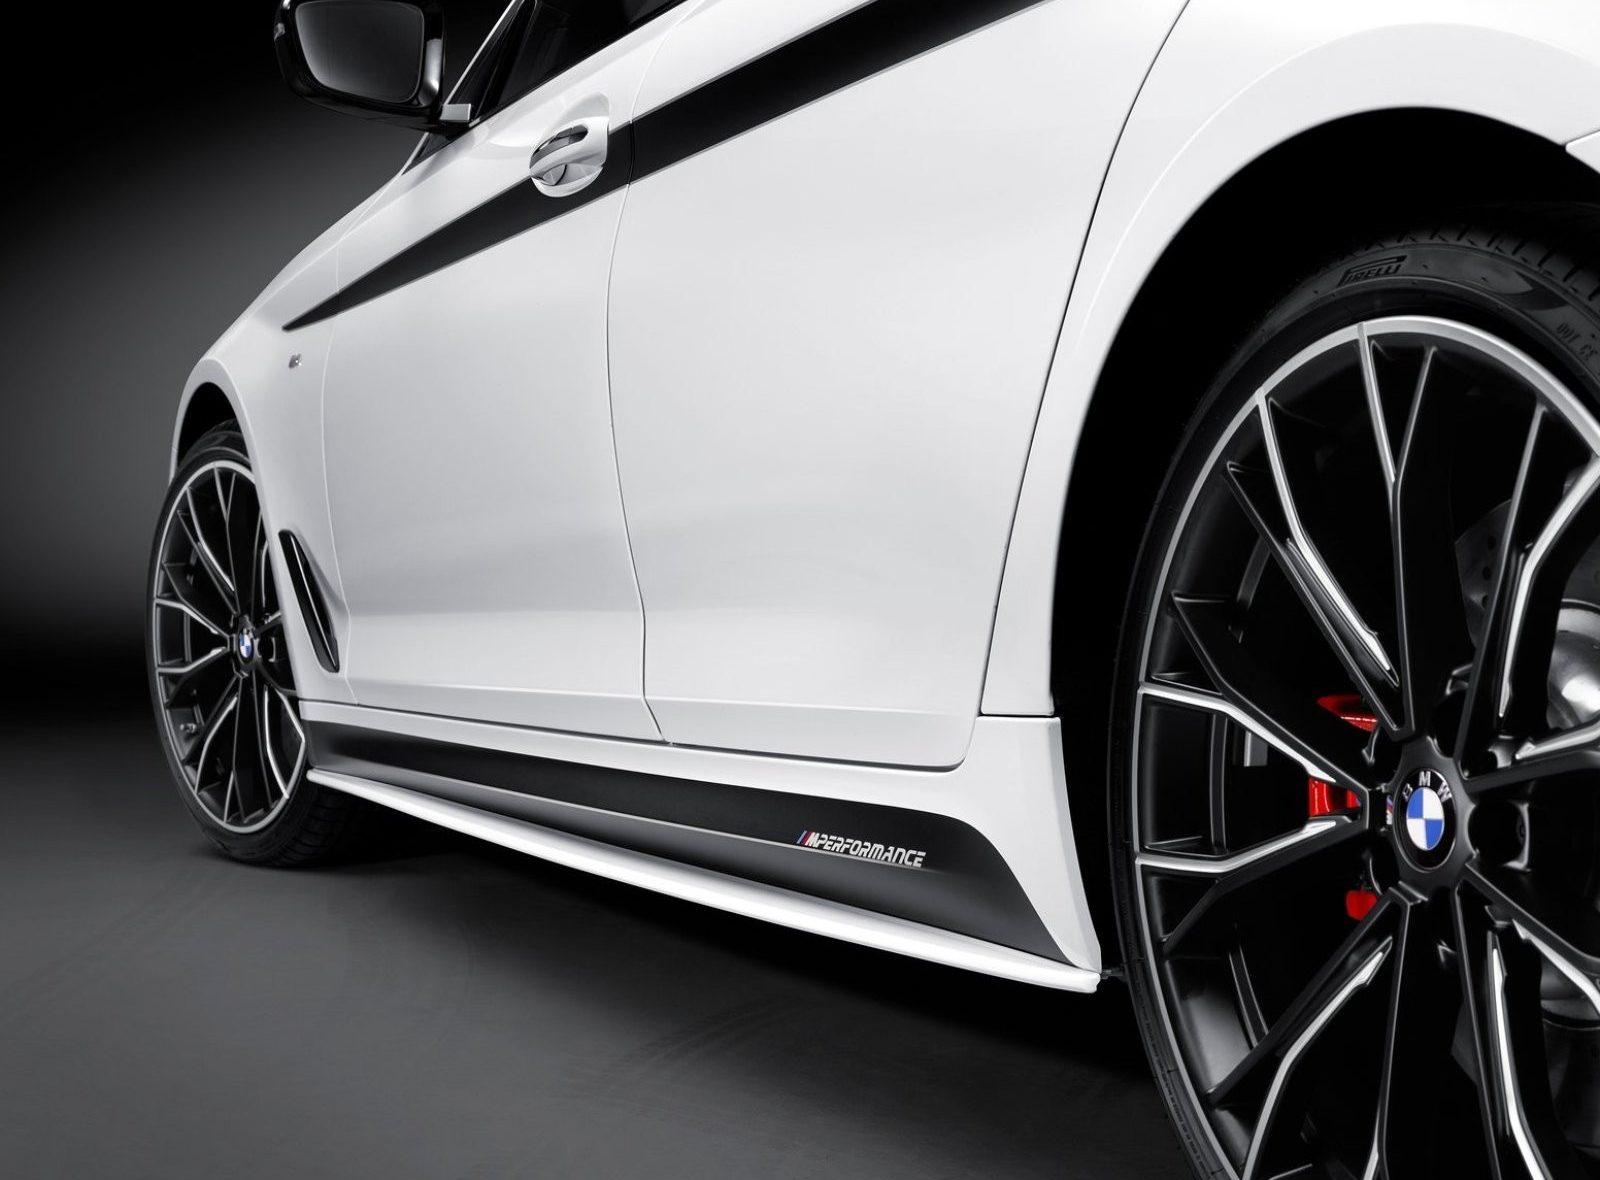 2017 Bmw 5 Series M Performance Parts Wheels And Rims 2 Za Top Range